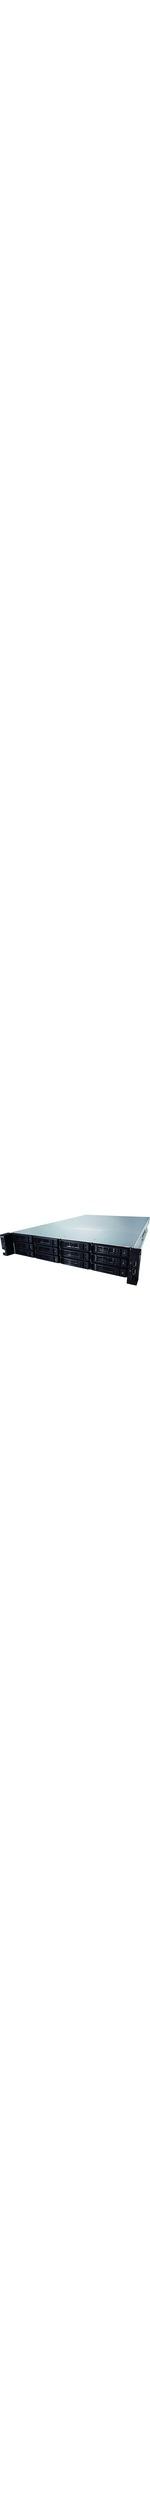 Buffalo TeraStation TS-2RZH96T12D 12 x Total Bays NAS Server - 2U - Rack-mountable